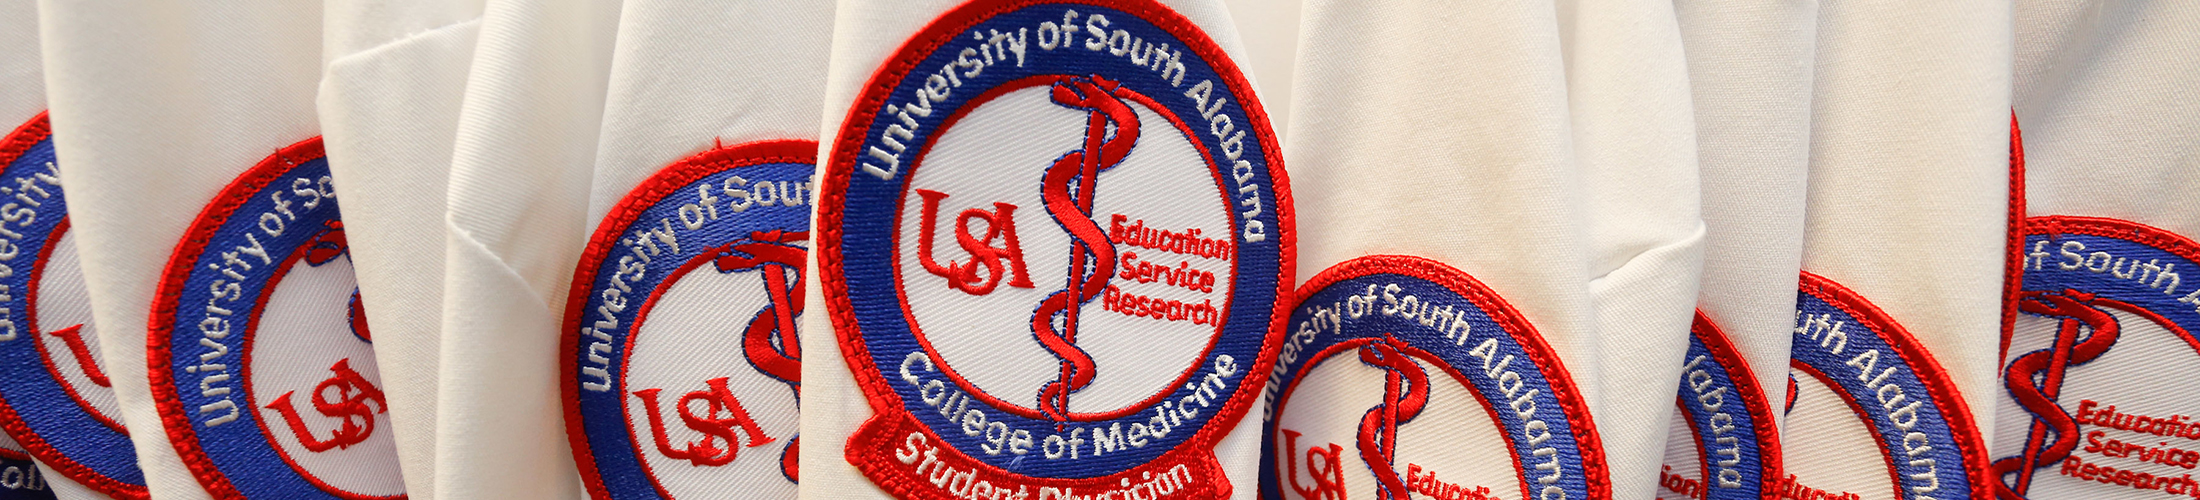 Medical School Patch